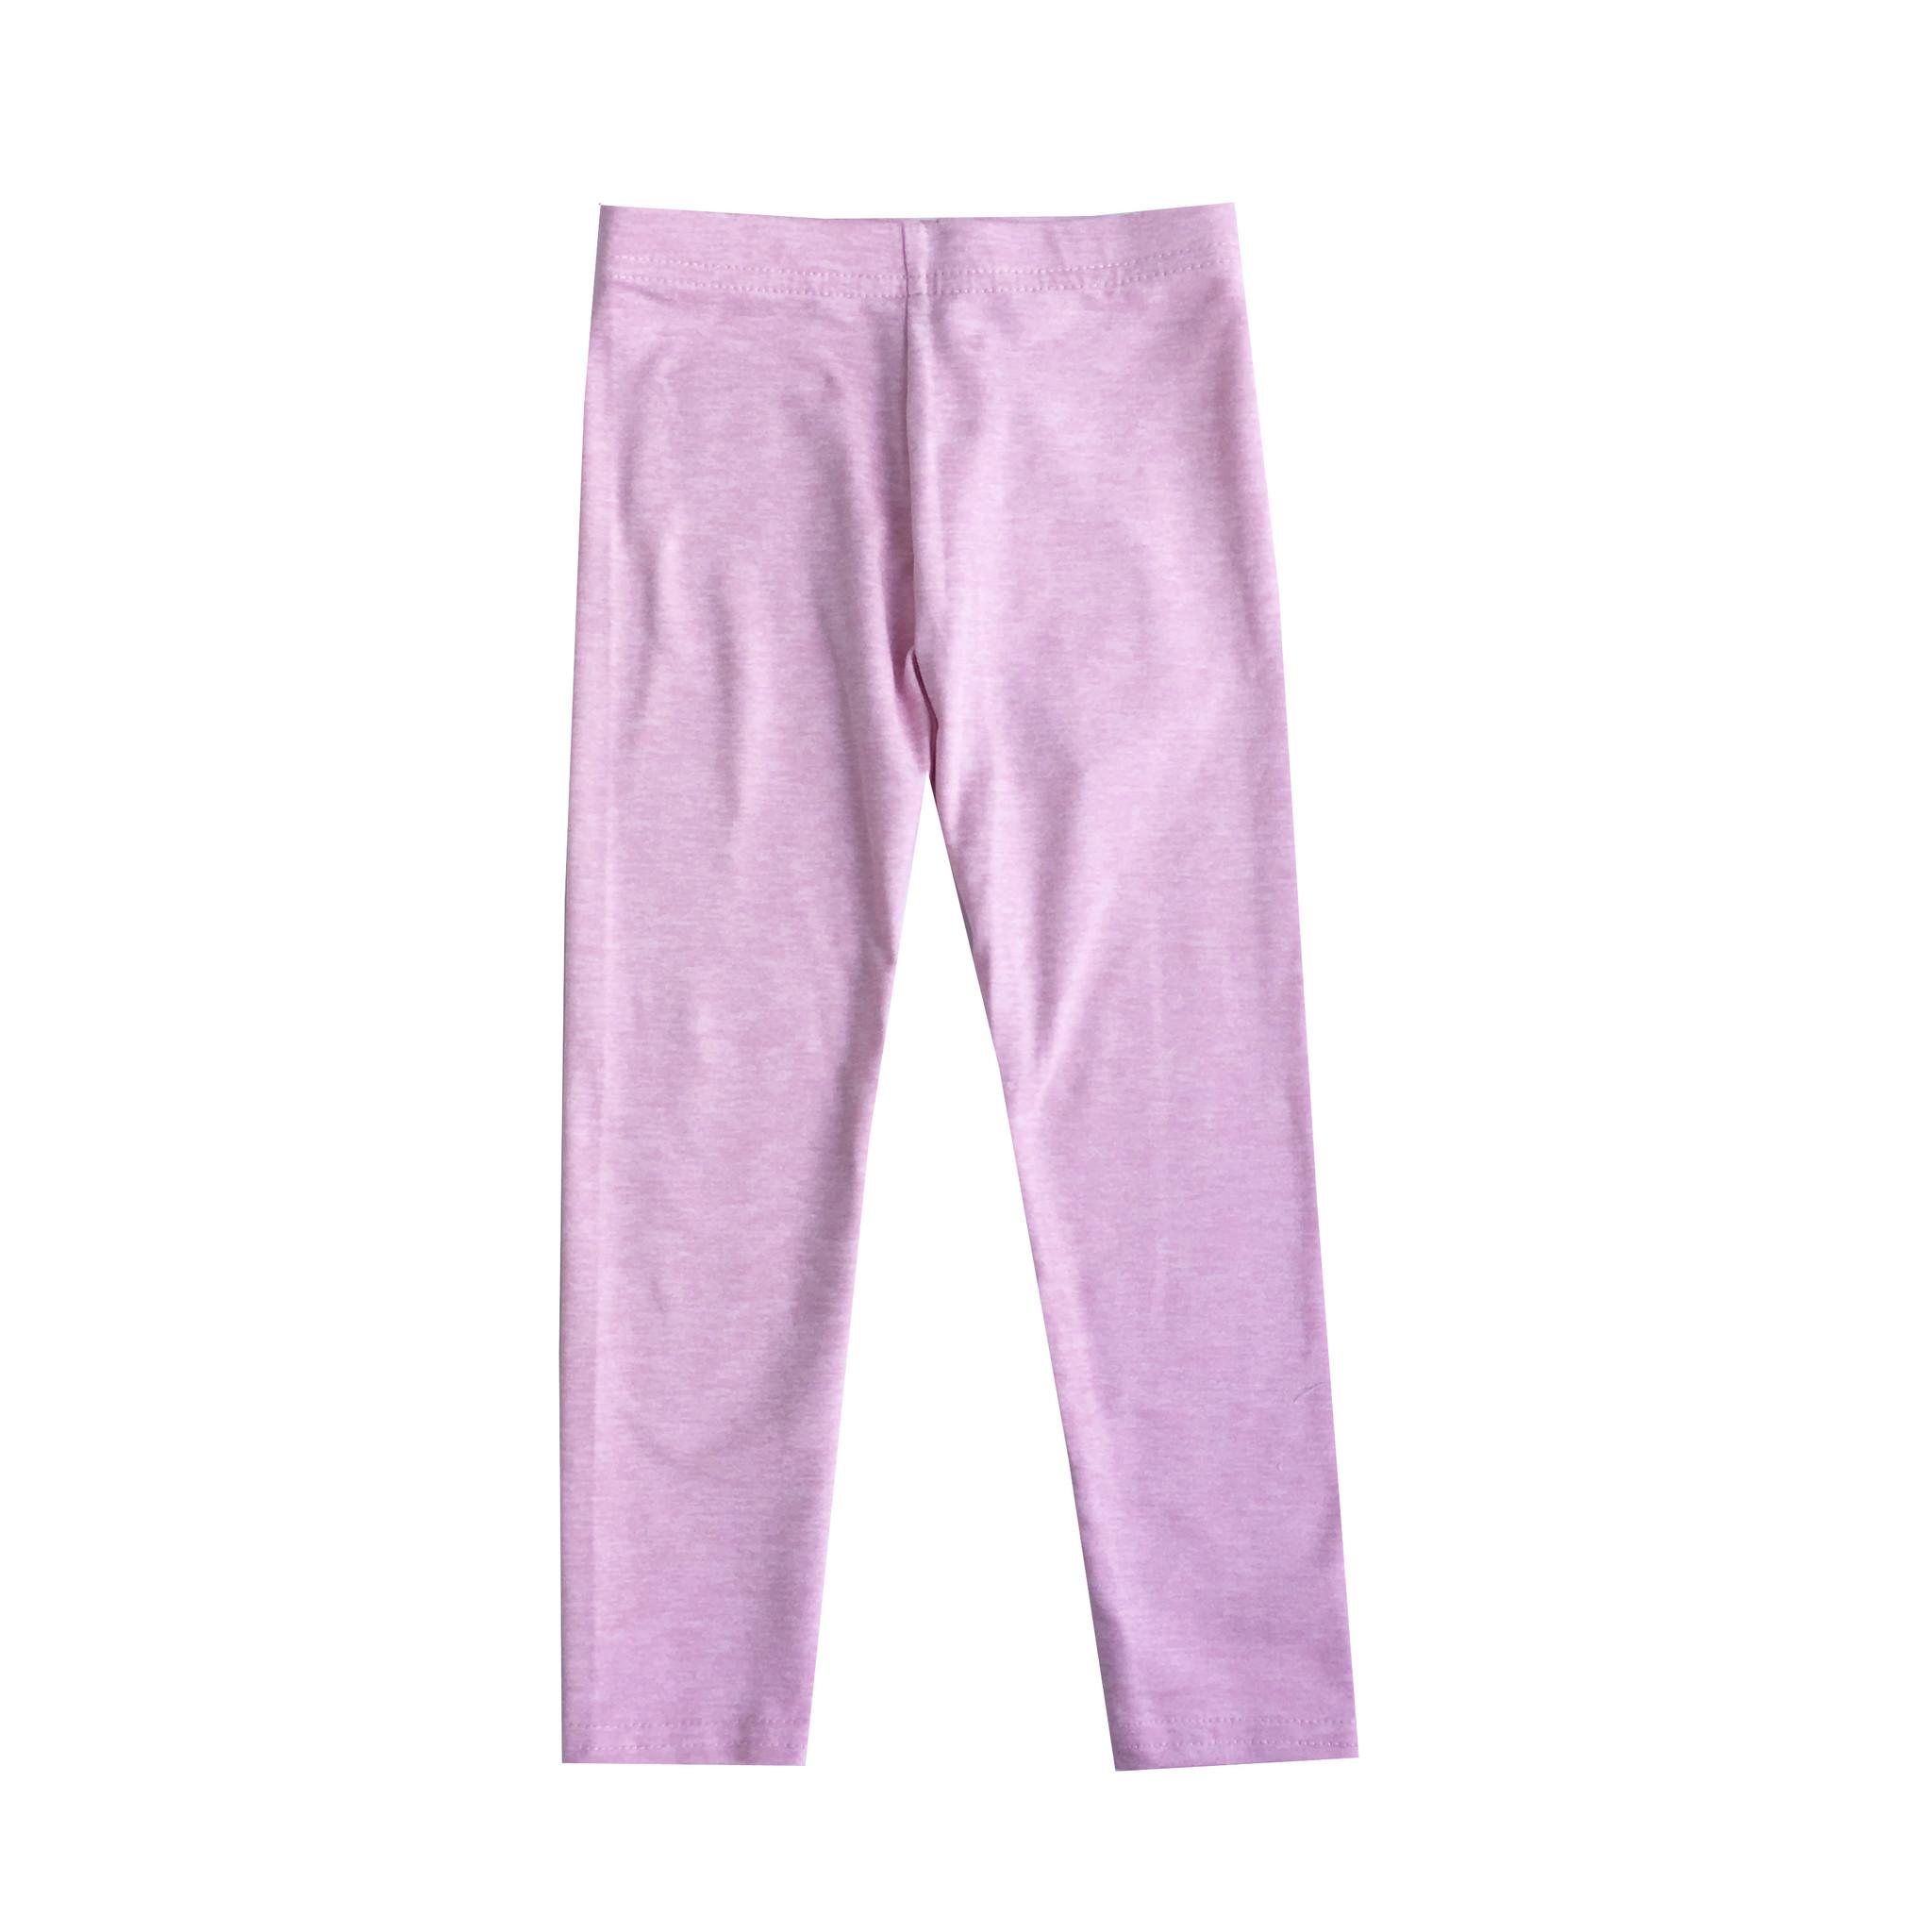 Dori Creations Lt. Pink/White Infant Heathered Legging